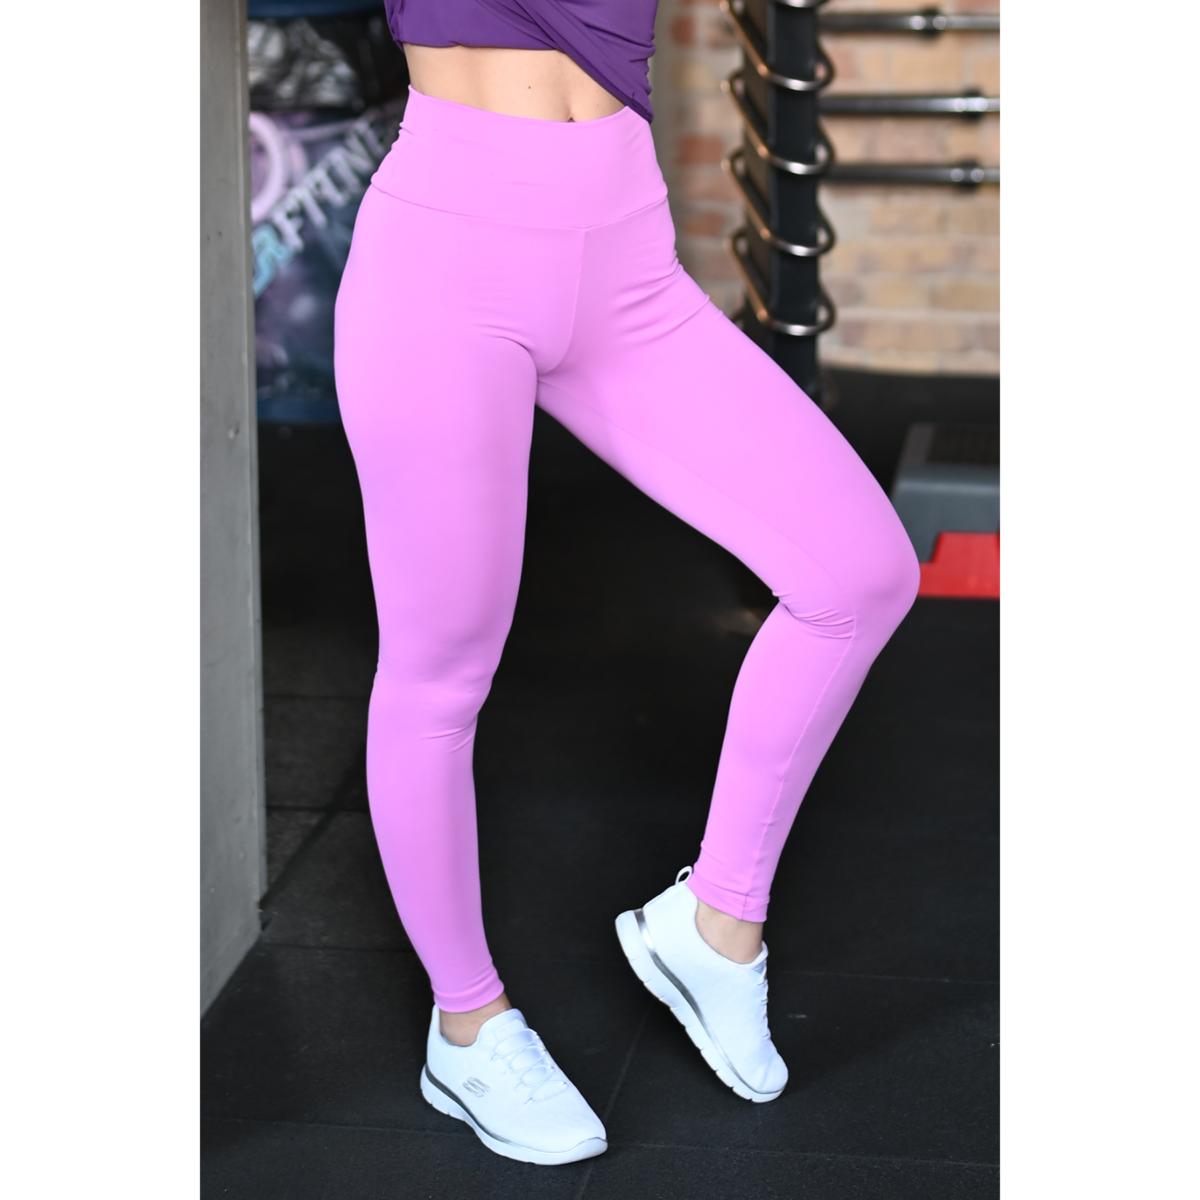 Világos orgona lila basic magasderekú női fitness sport leggings